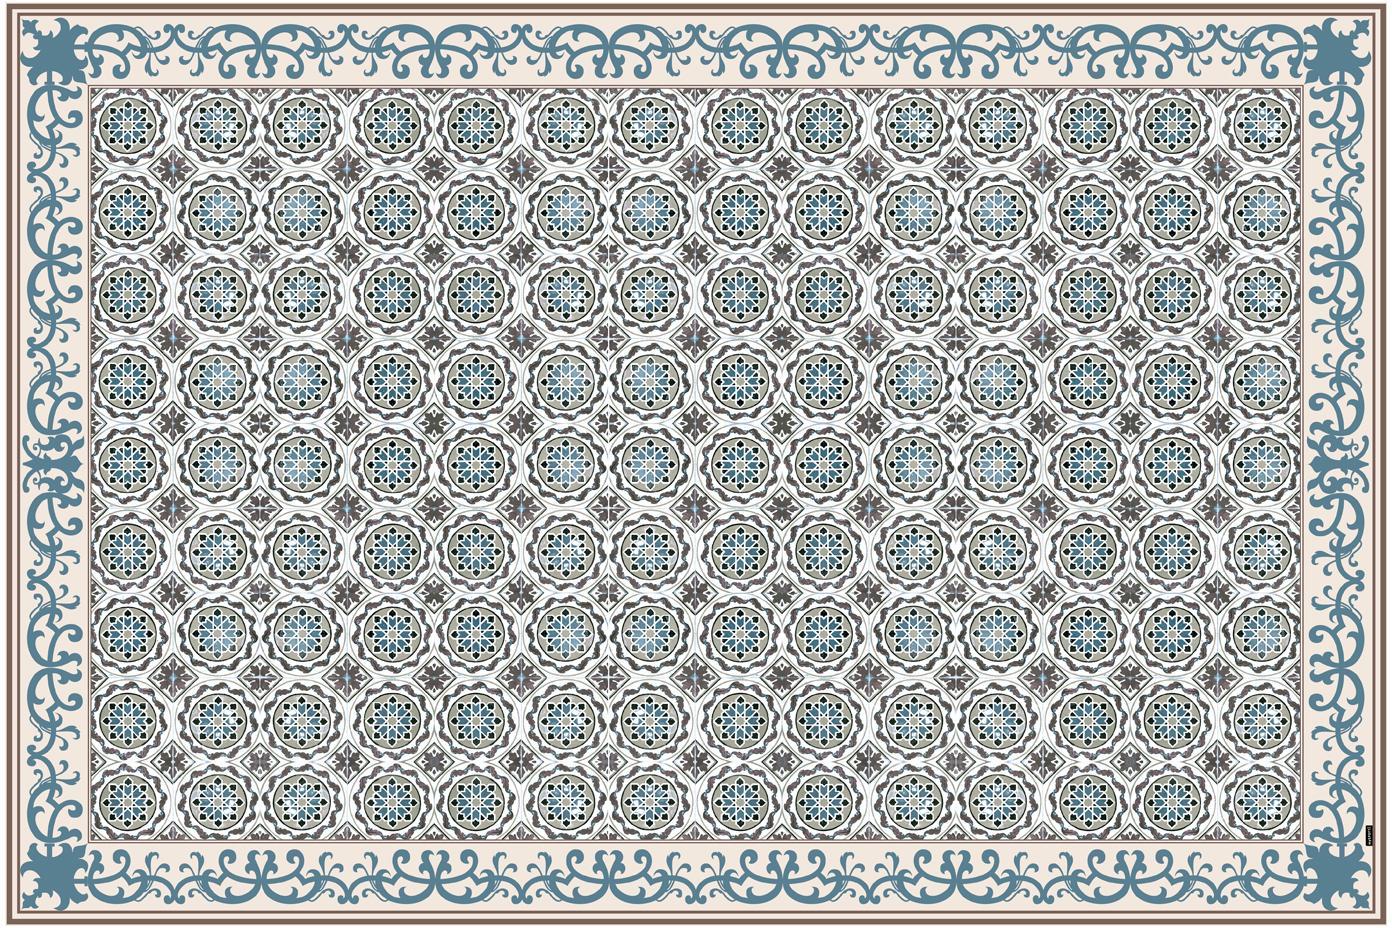 Vinyl-Bodenmatte Selina, Vinyl, recycelbar, Beige, Braun, Blau, 135 x 200 cm